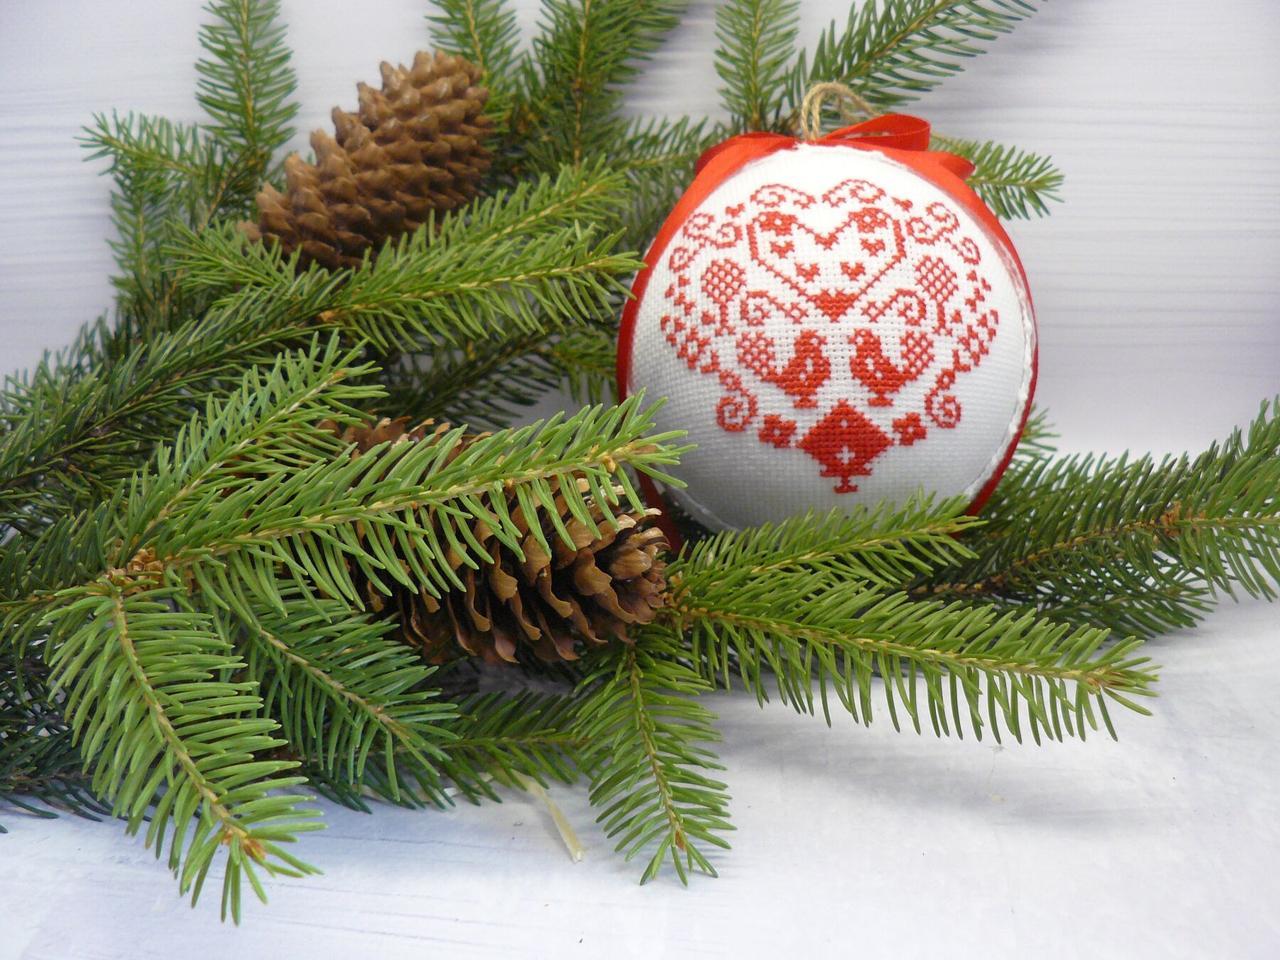 SN-5 Набор для творчества. Новогодняя игрушка-шар на елку